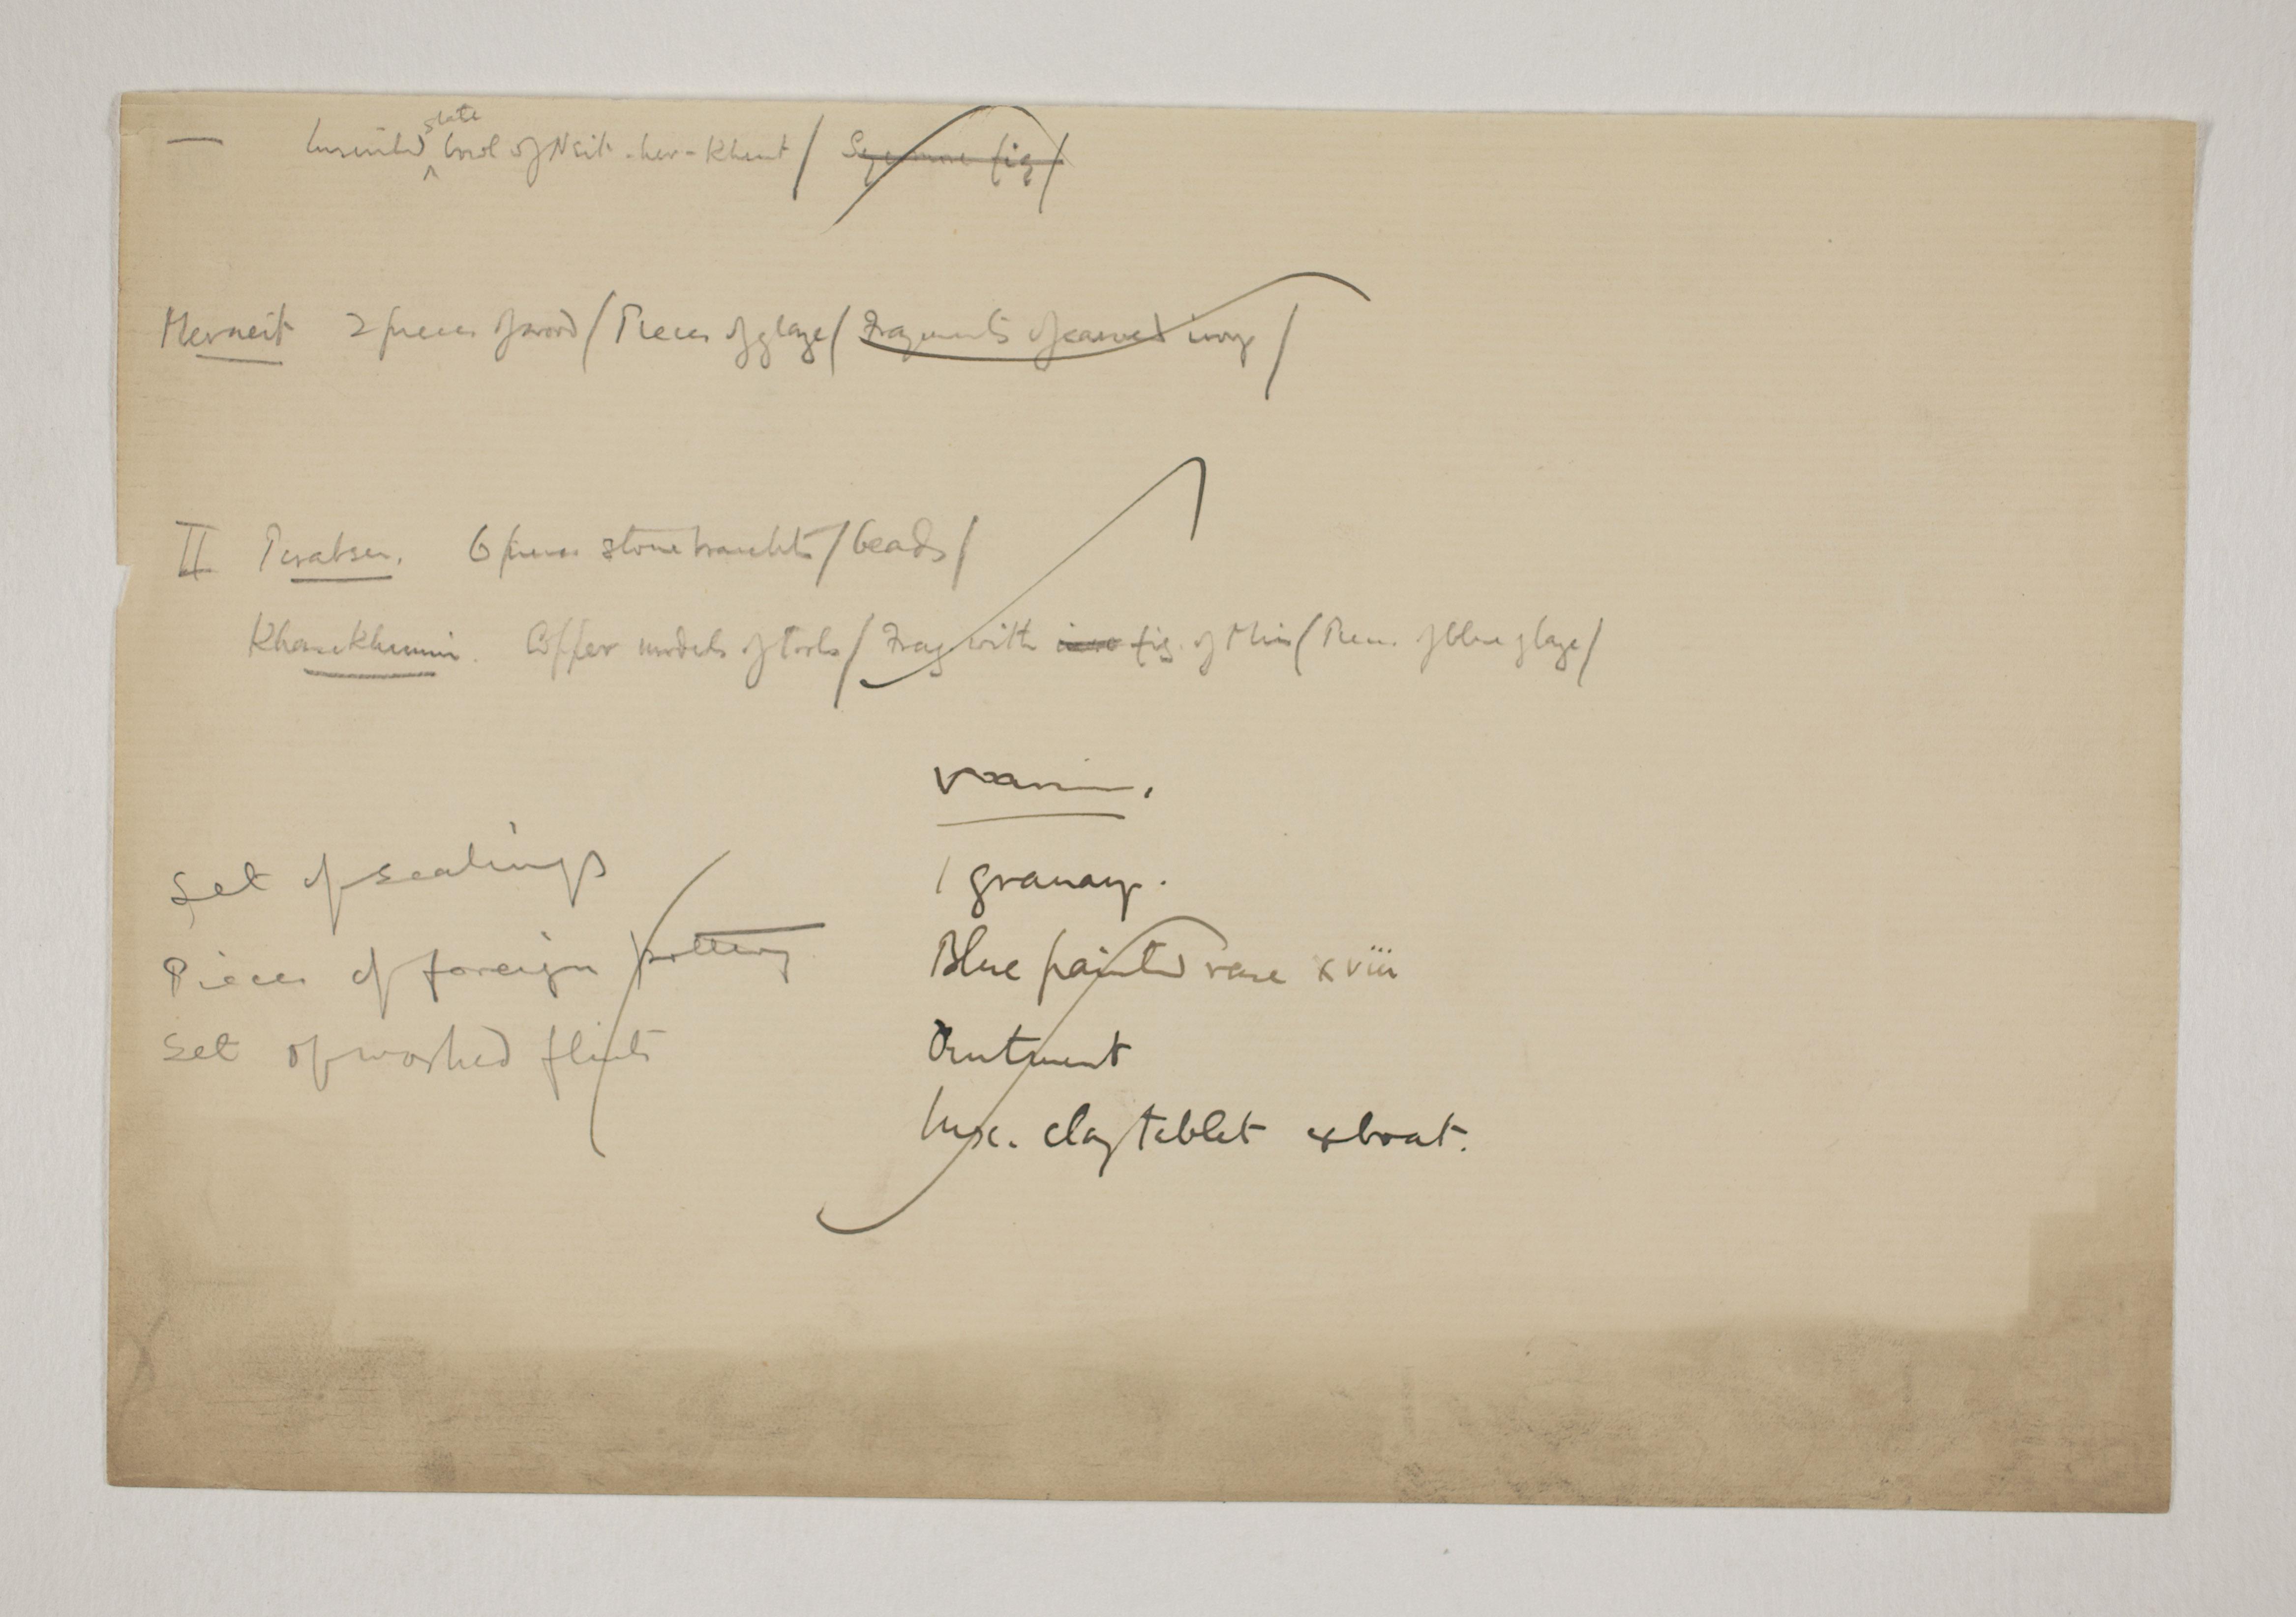 Abydos, Bet Khallaf, el-Mahasna 1900-1901, Individual Institution List, PMA/WFP1/D/9/12.2